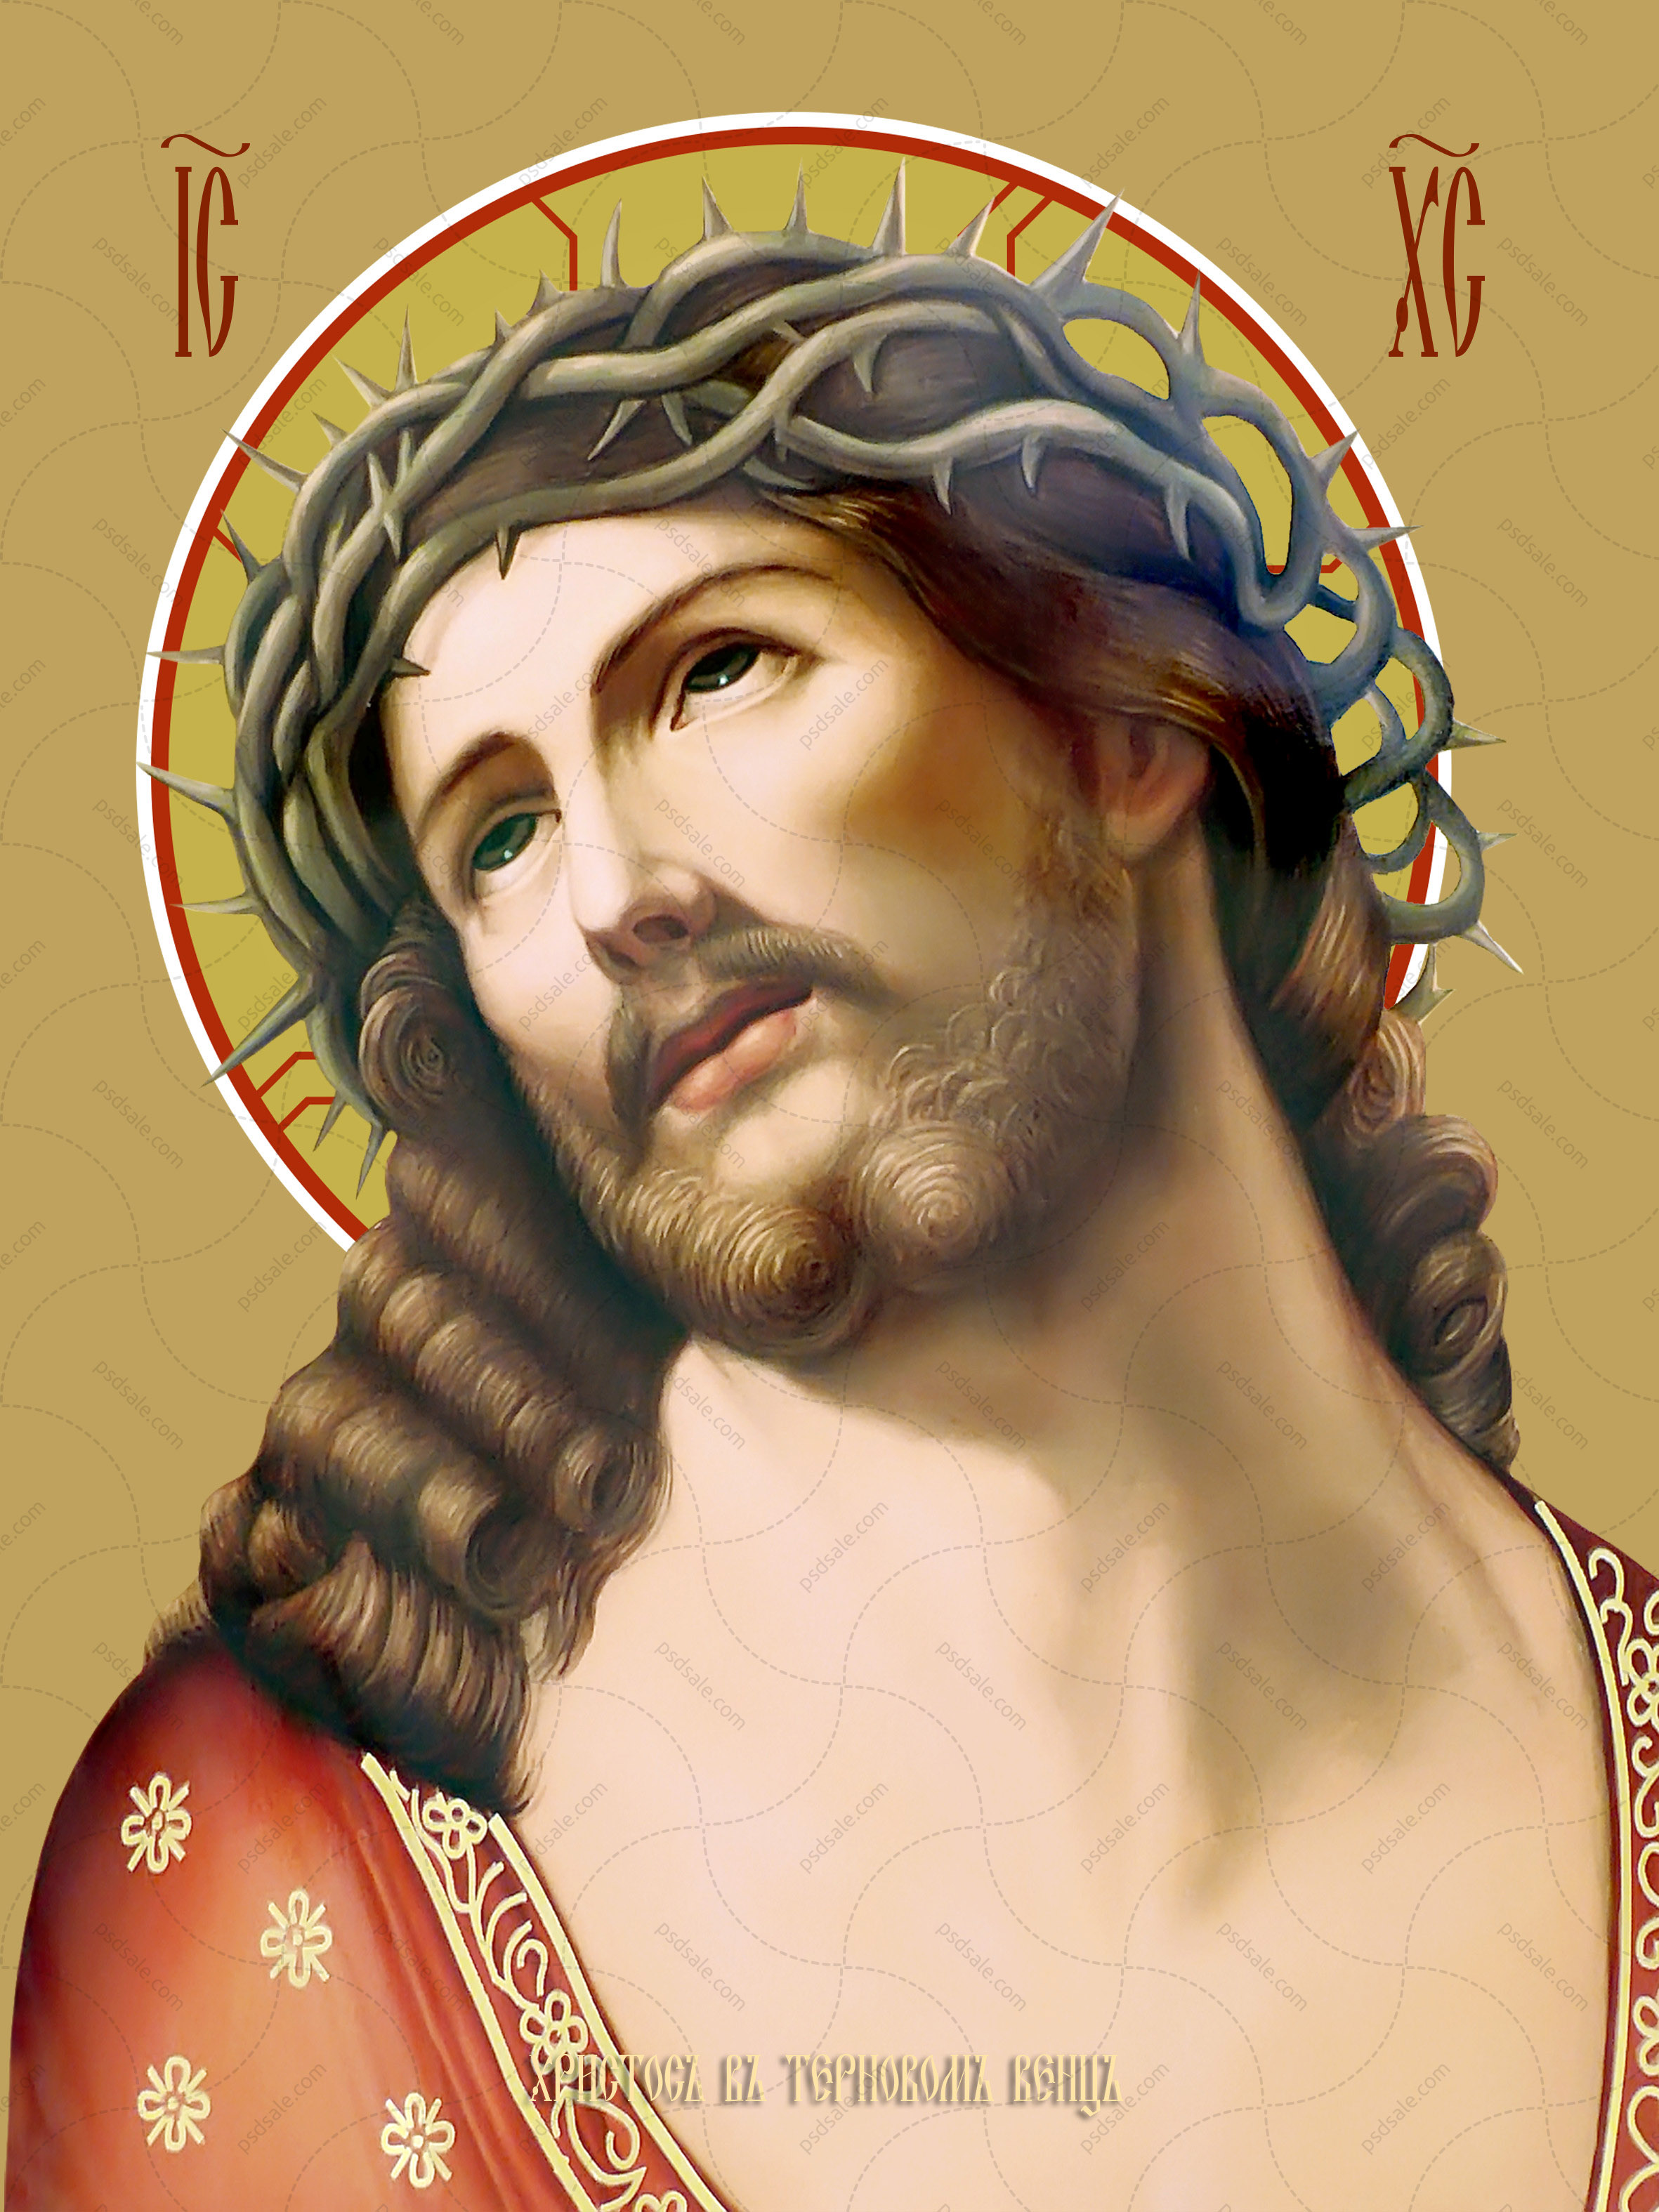 Господь в терновом венце